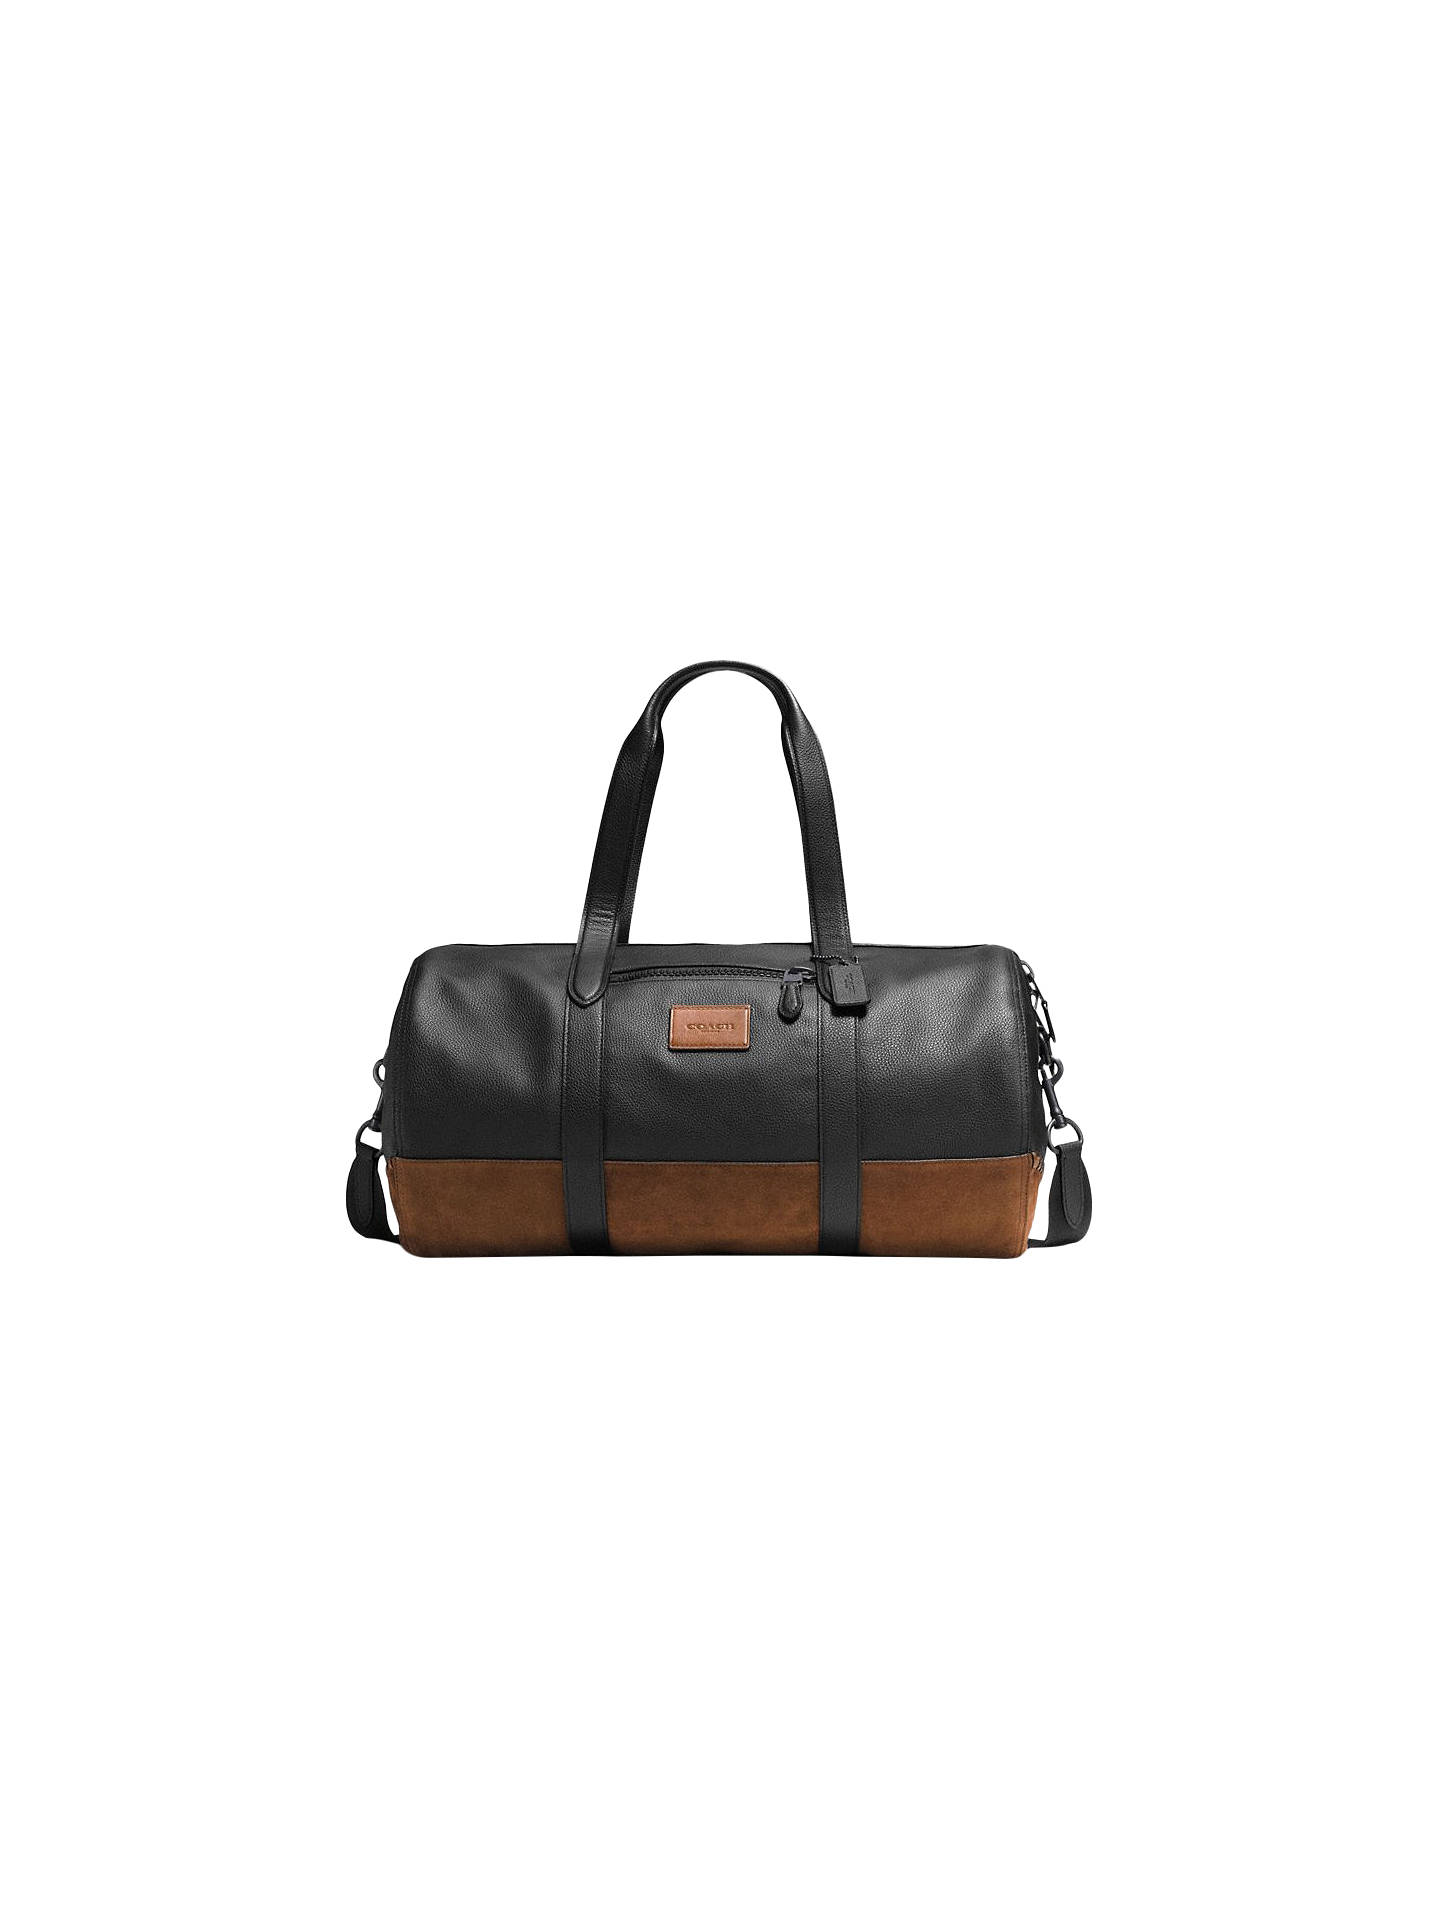 94bbb5f07604 Coach Metropolitan Leather Gym Bag at John Lewis   Partners